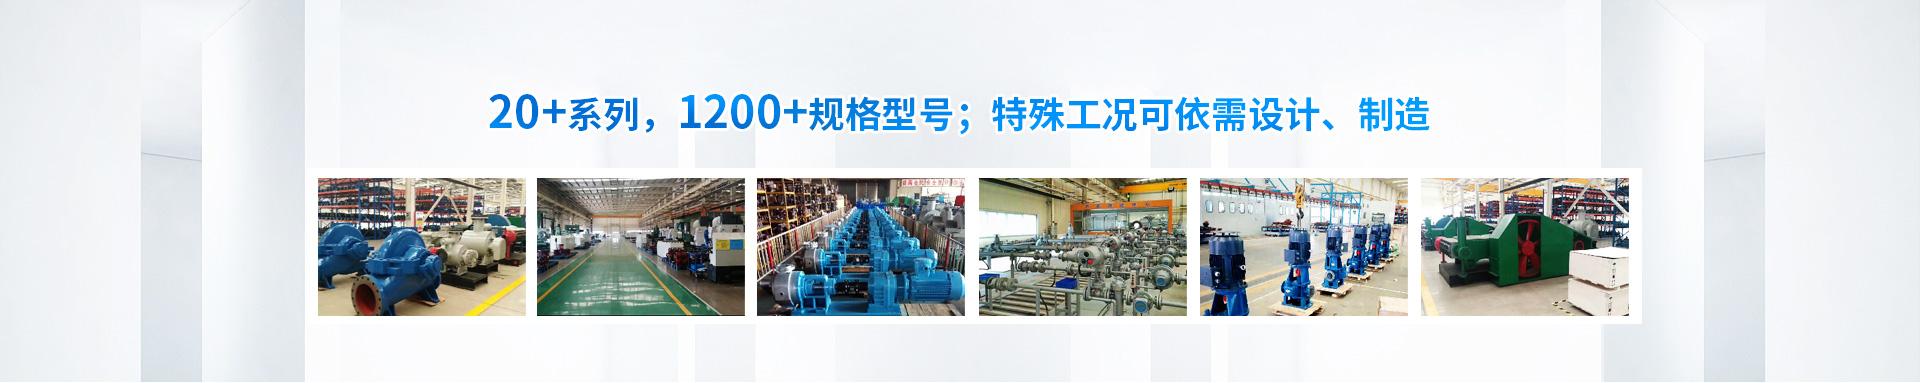 20+xi列,1200+规格型号;特殊工况可依xu设ji、zhi造